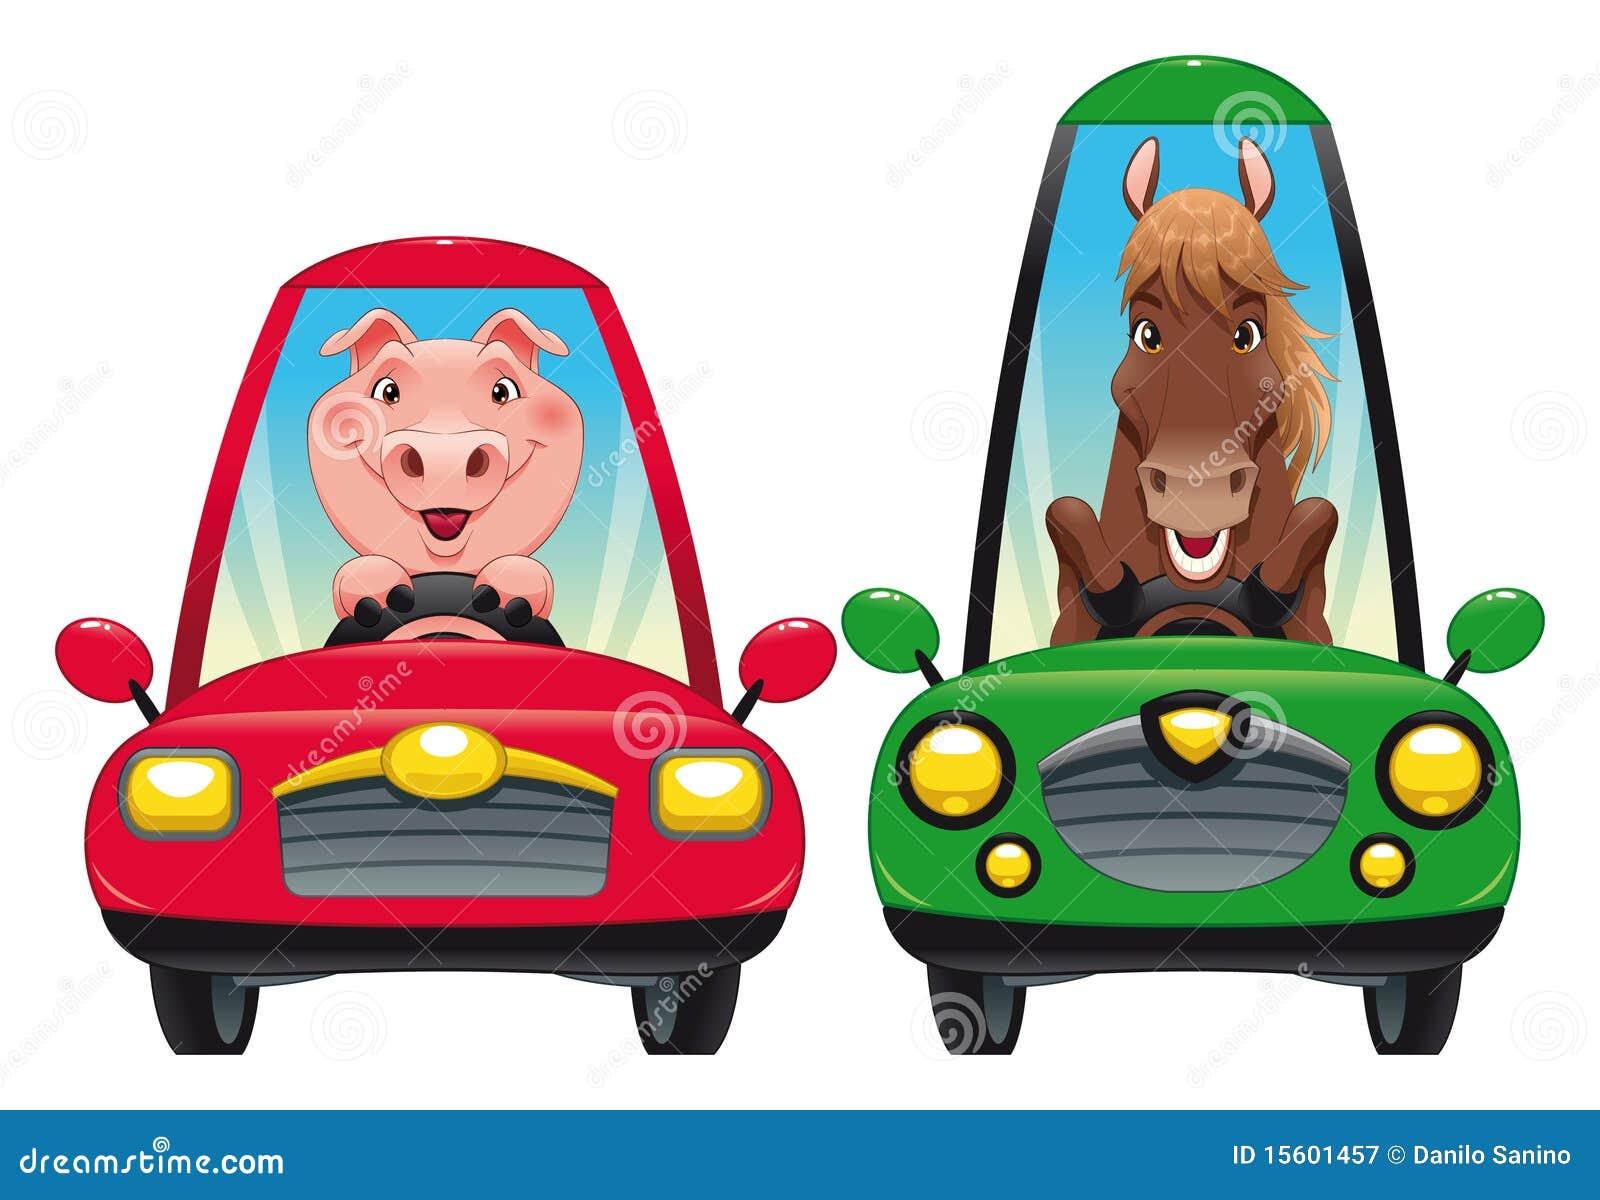 Elephant Driving A Car Clipart